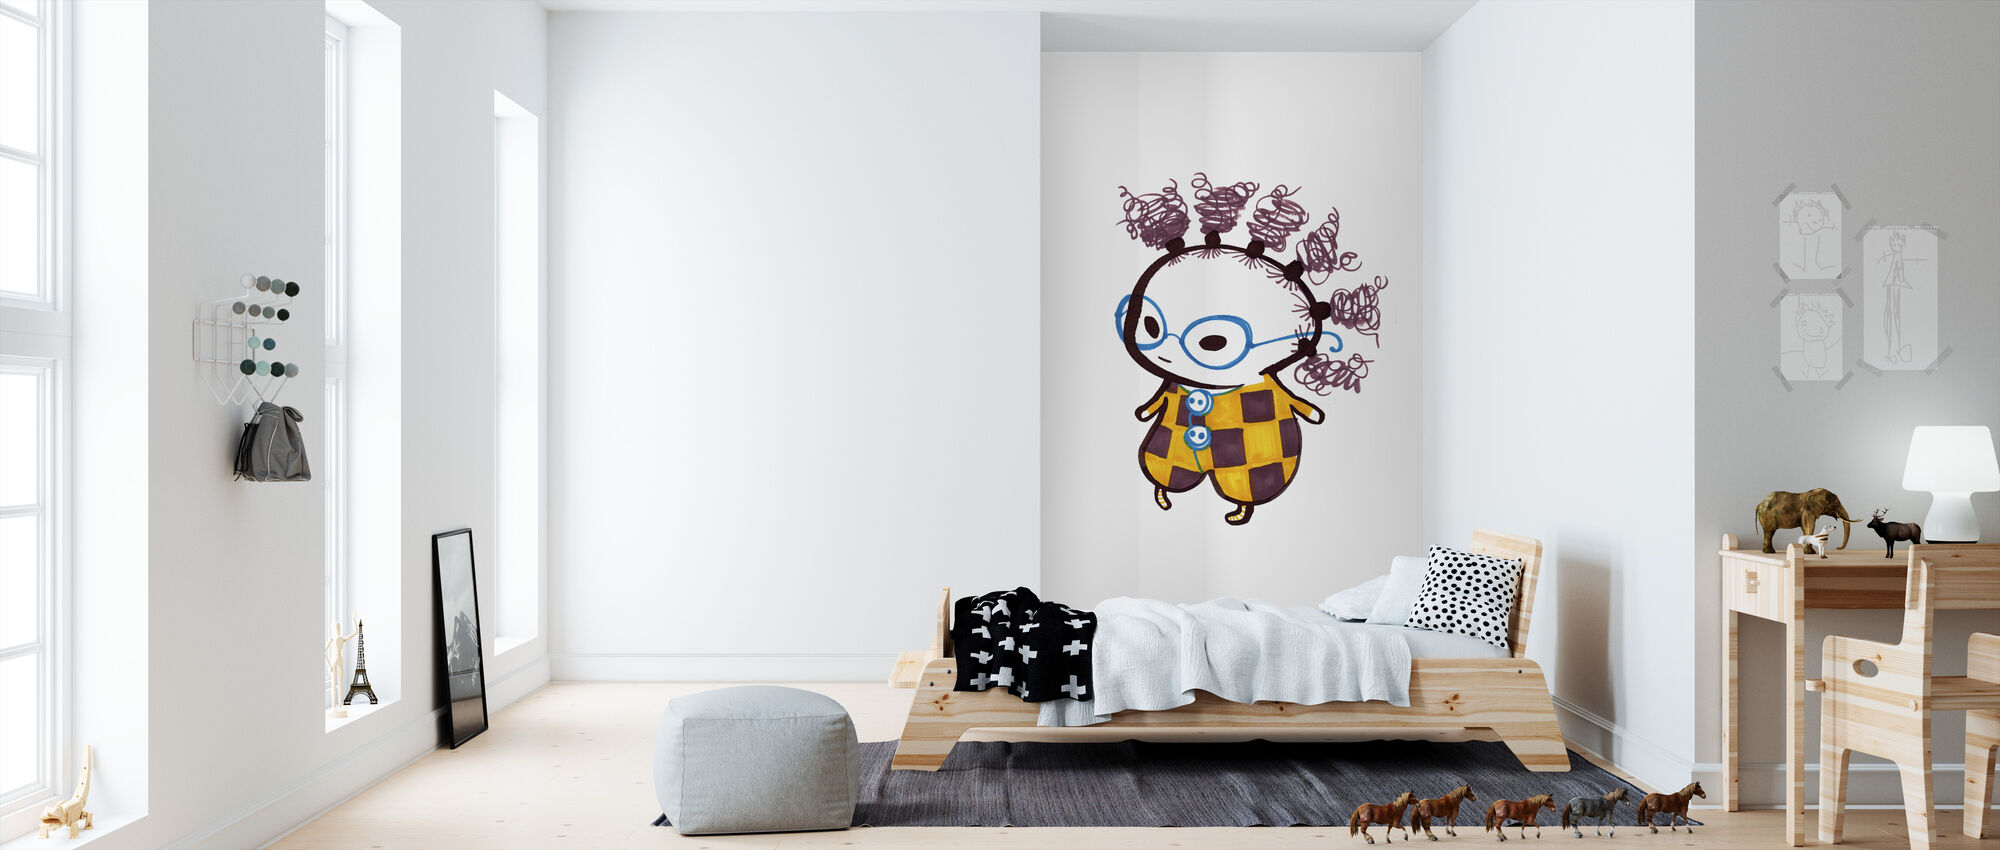 Ulla-Maja - Wallpaper - Kids Room